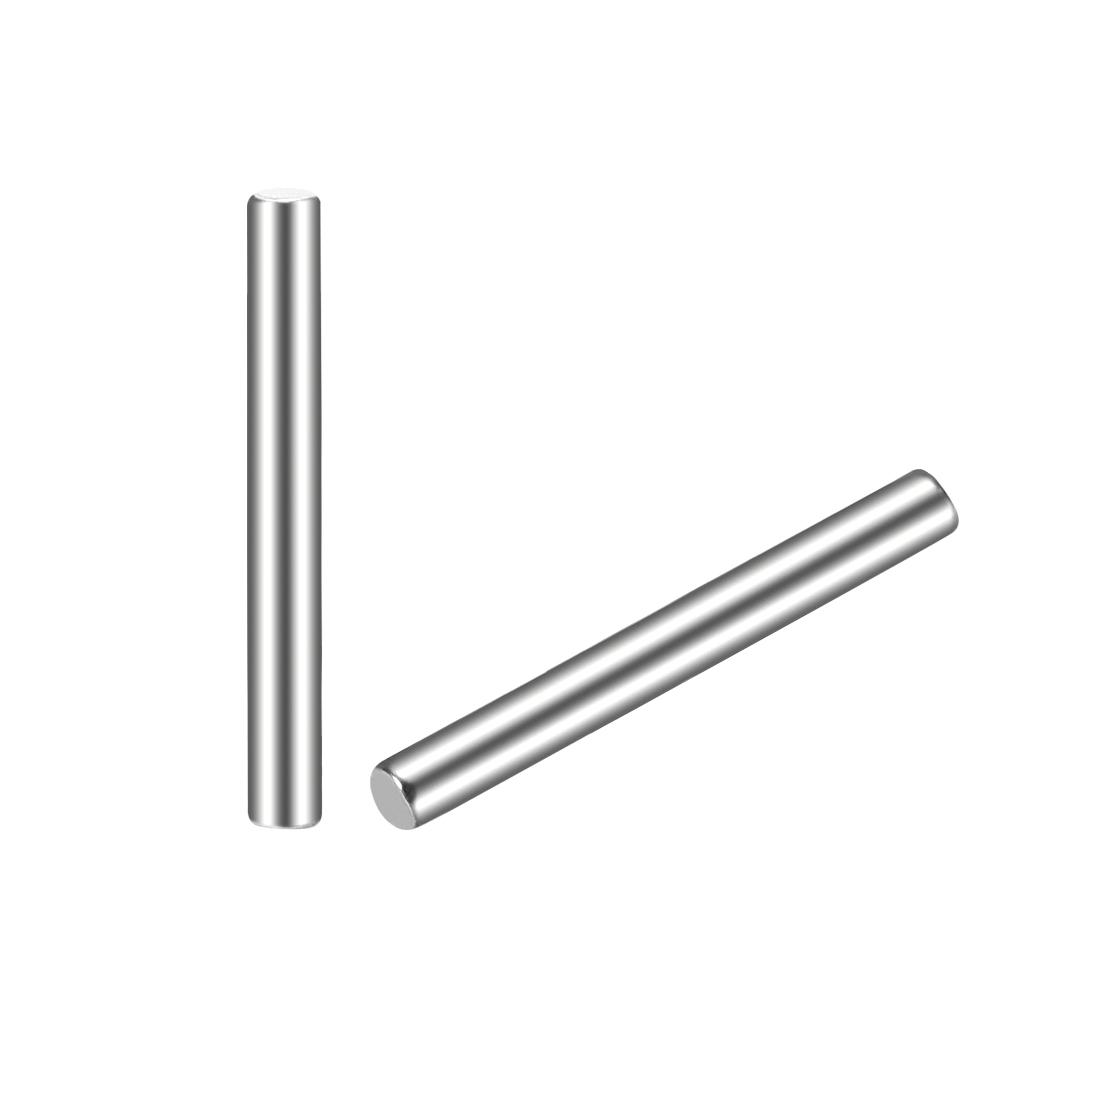 20Pcs 2mm x 18mm Dowel Pin 304 Stainless Steel Shelf Support Pin Fasten